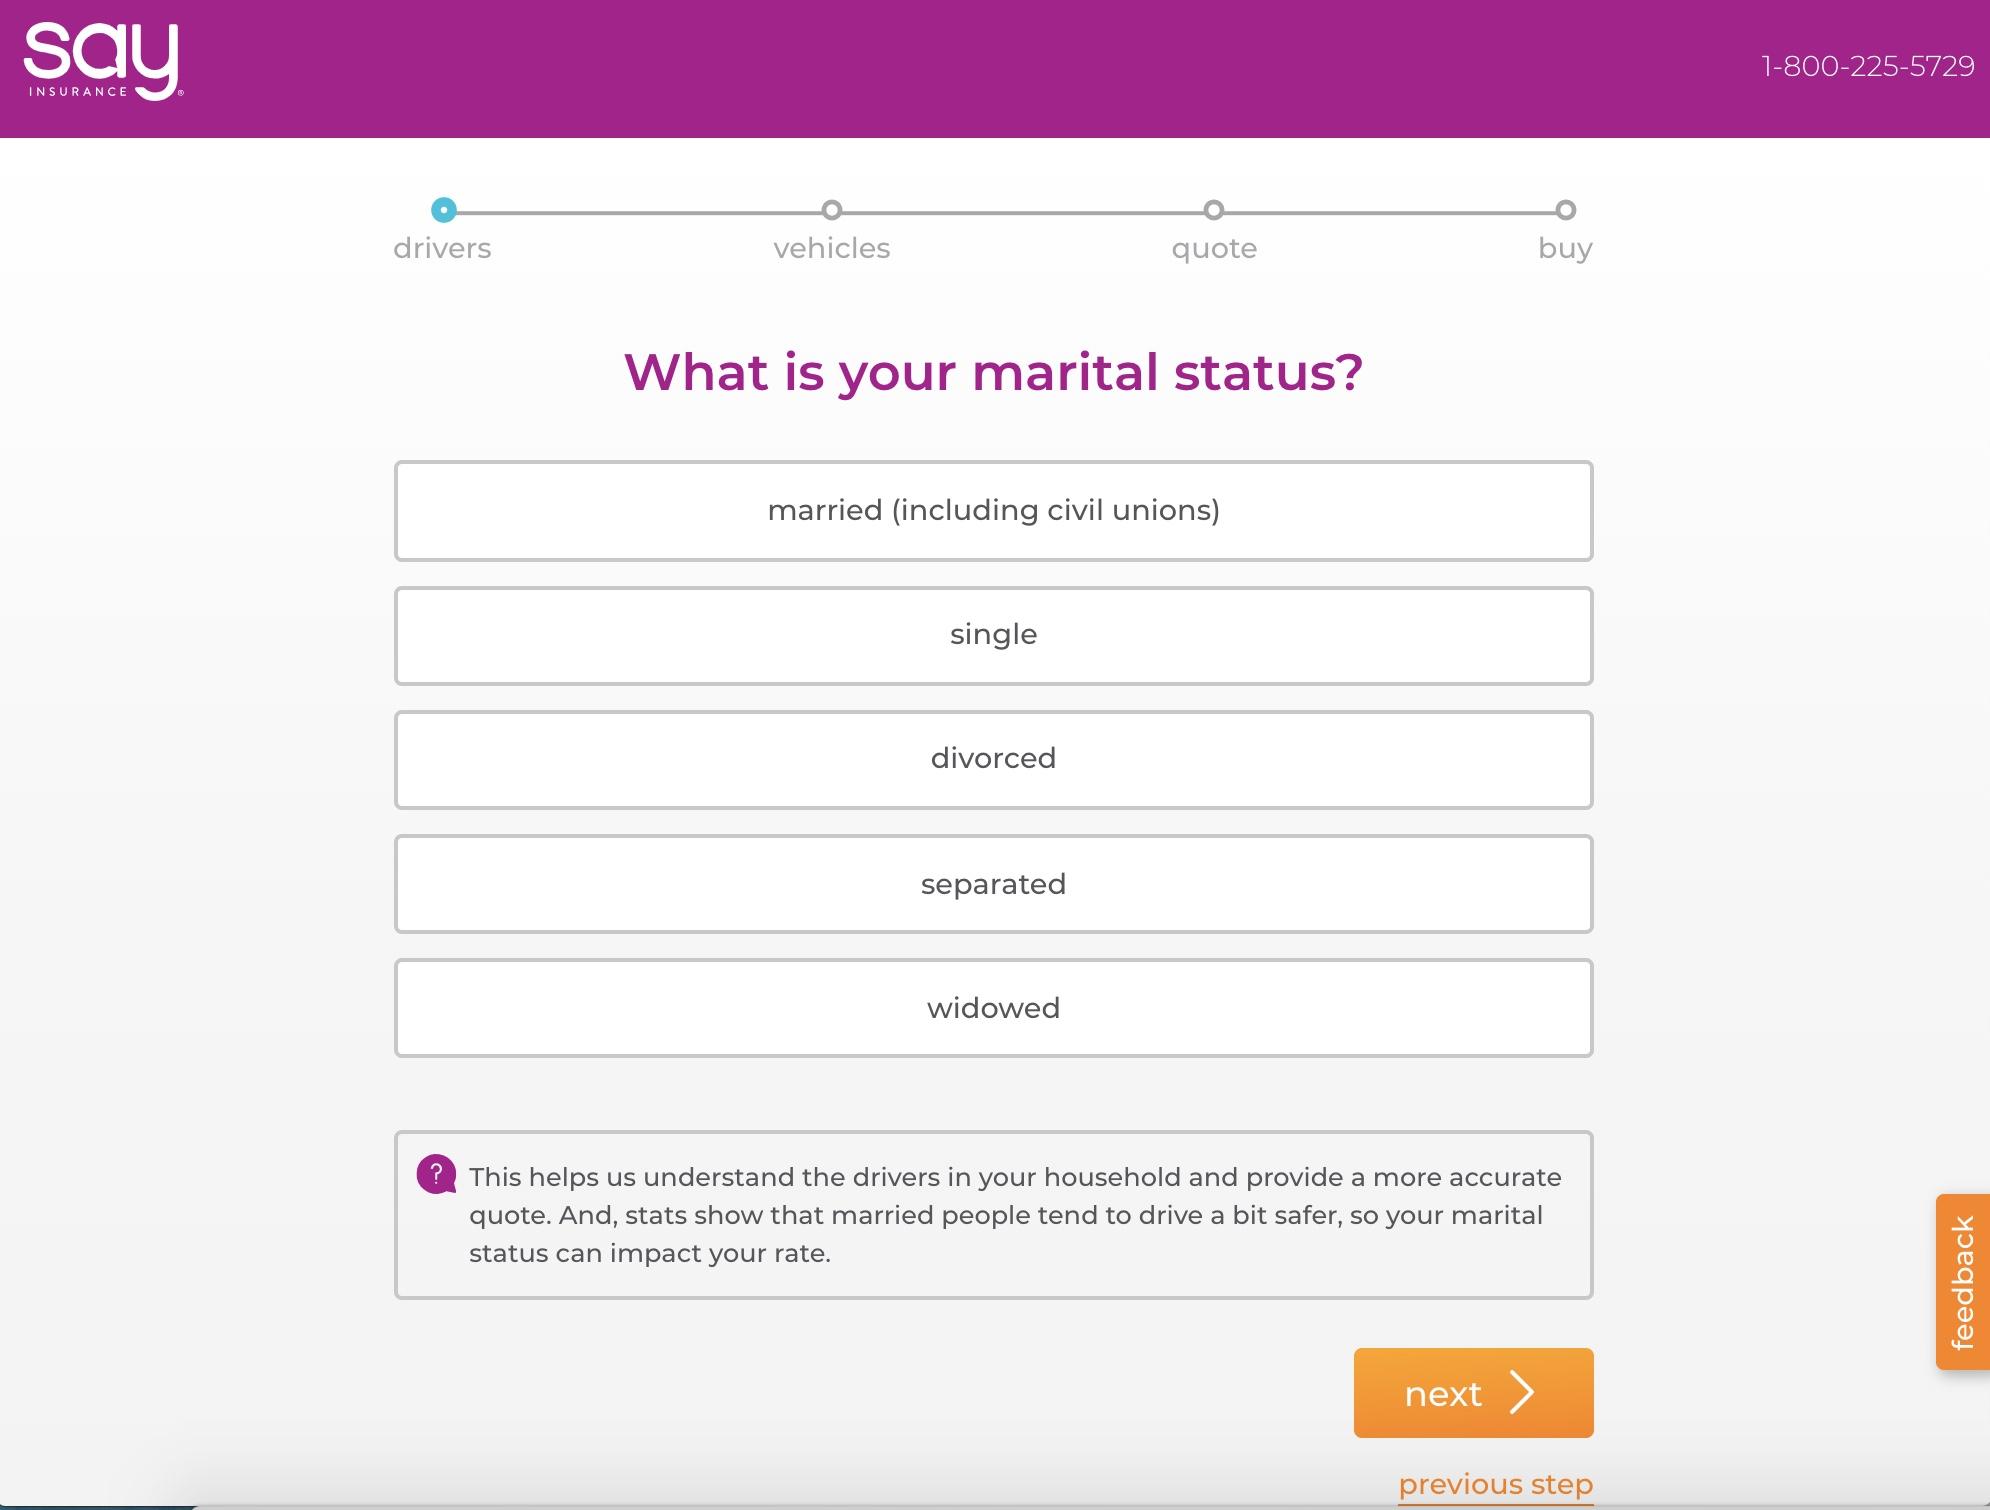 9-marital status.jpeg